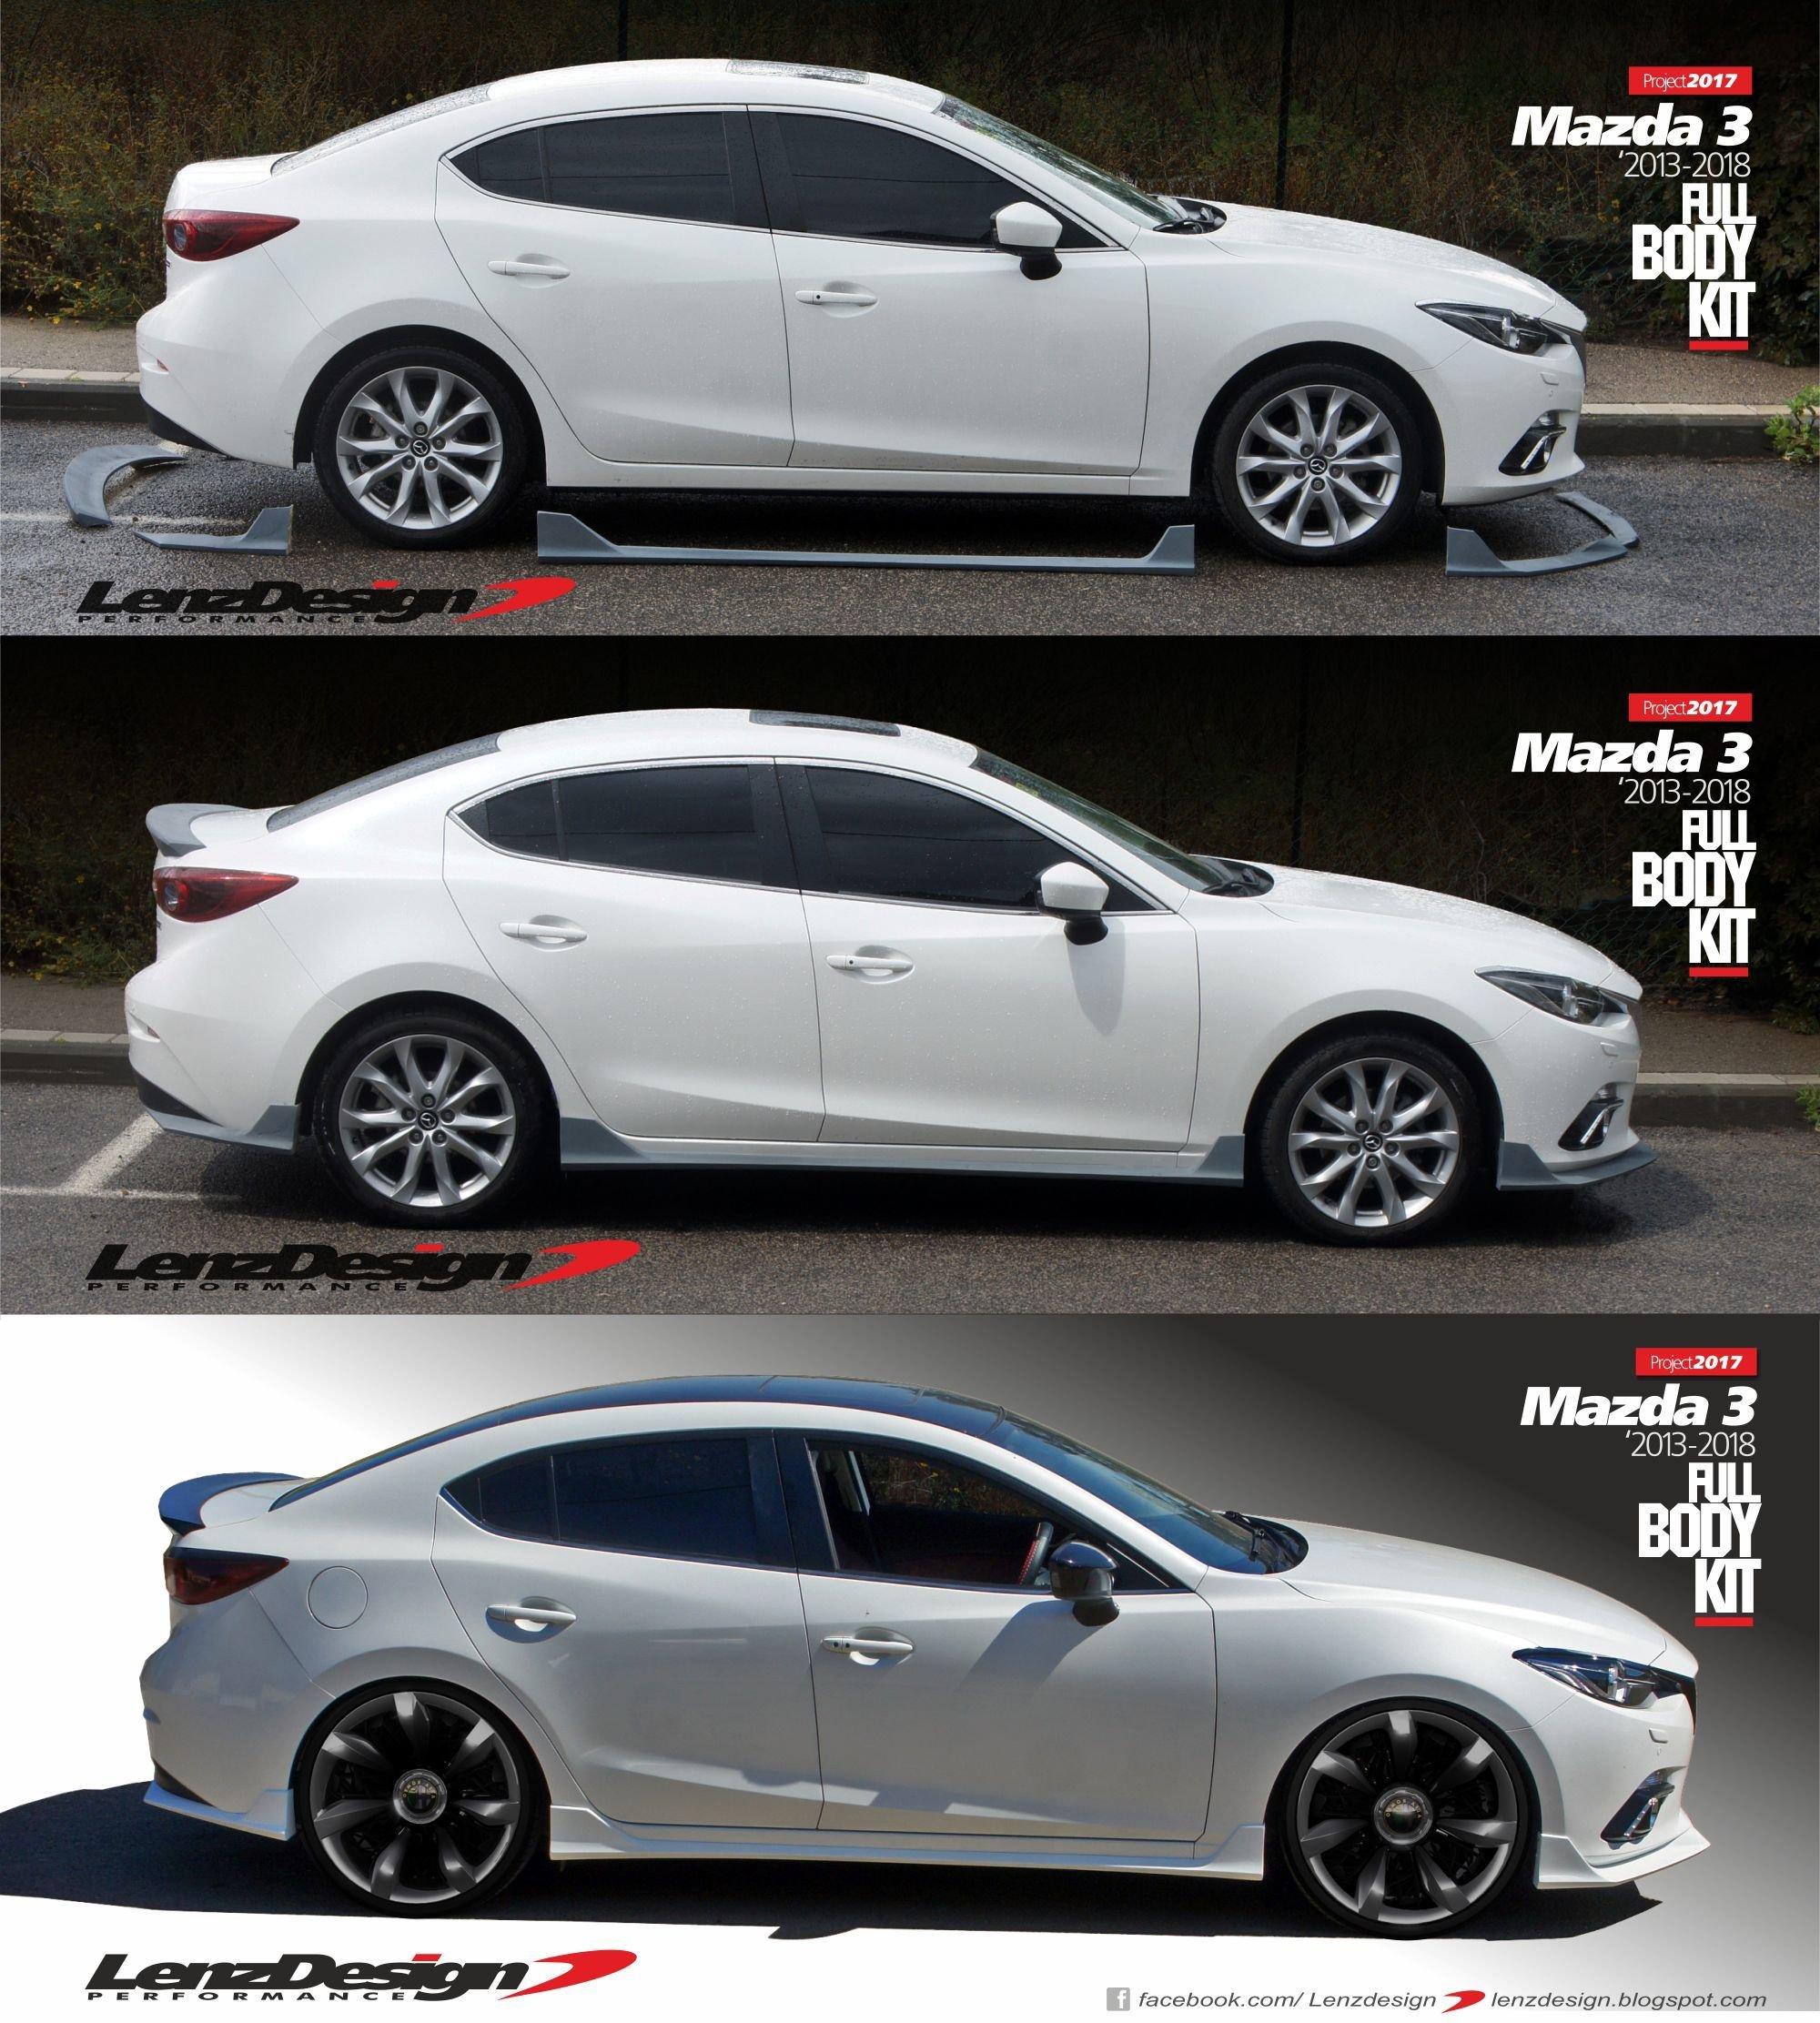 mazda 3 body kits best cars modified dur a flex. Black Bedroom Furniture Sets. Home Design Ideas